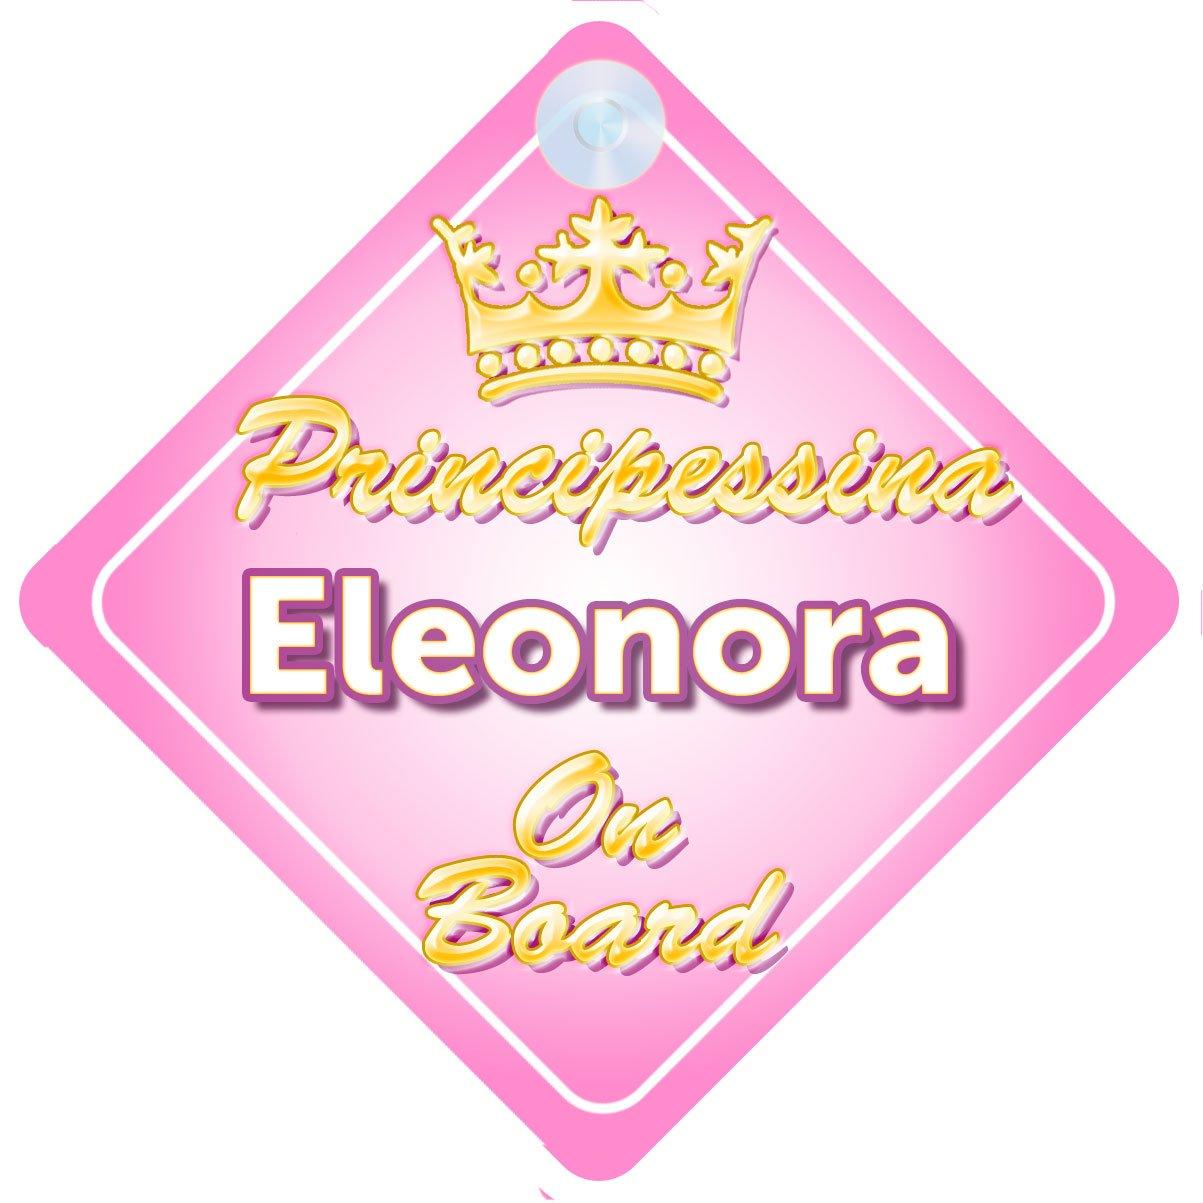 Principessina Eleonora (Crown/Corona) adesivo bimbo / bambina / neonato a bordo per femmina adesivo macchina, bimbi, bambini, famiglia mybabyonboard UK